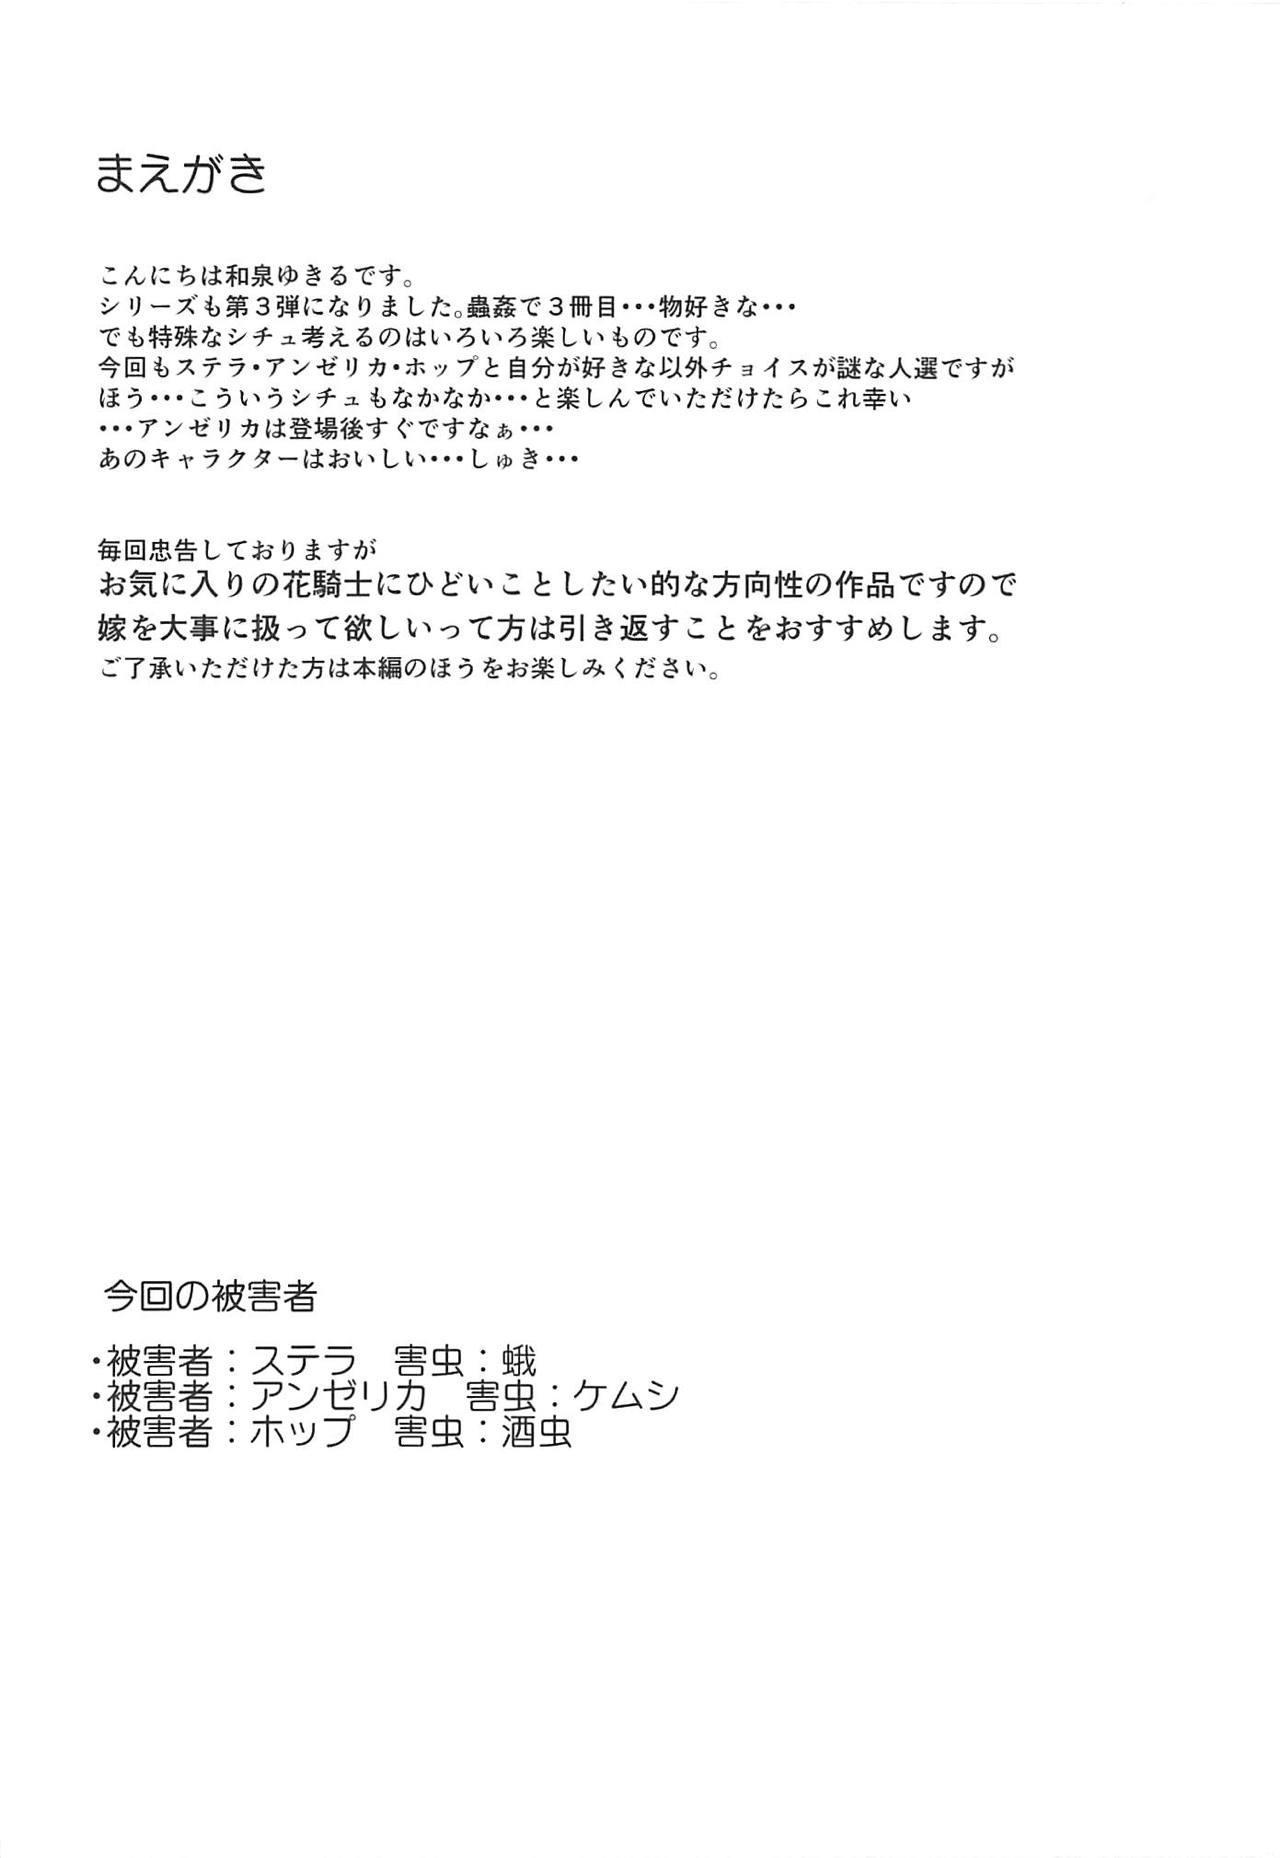 Gaichuu Higai Houkokusho File 3 2